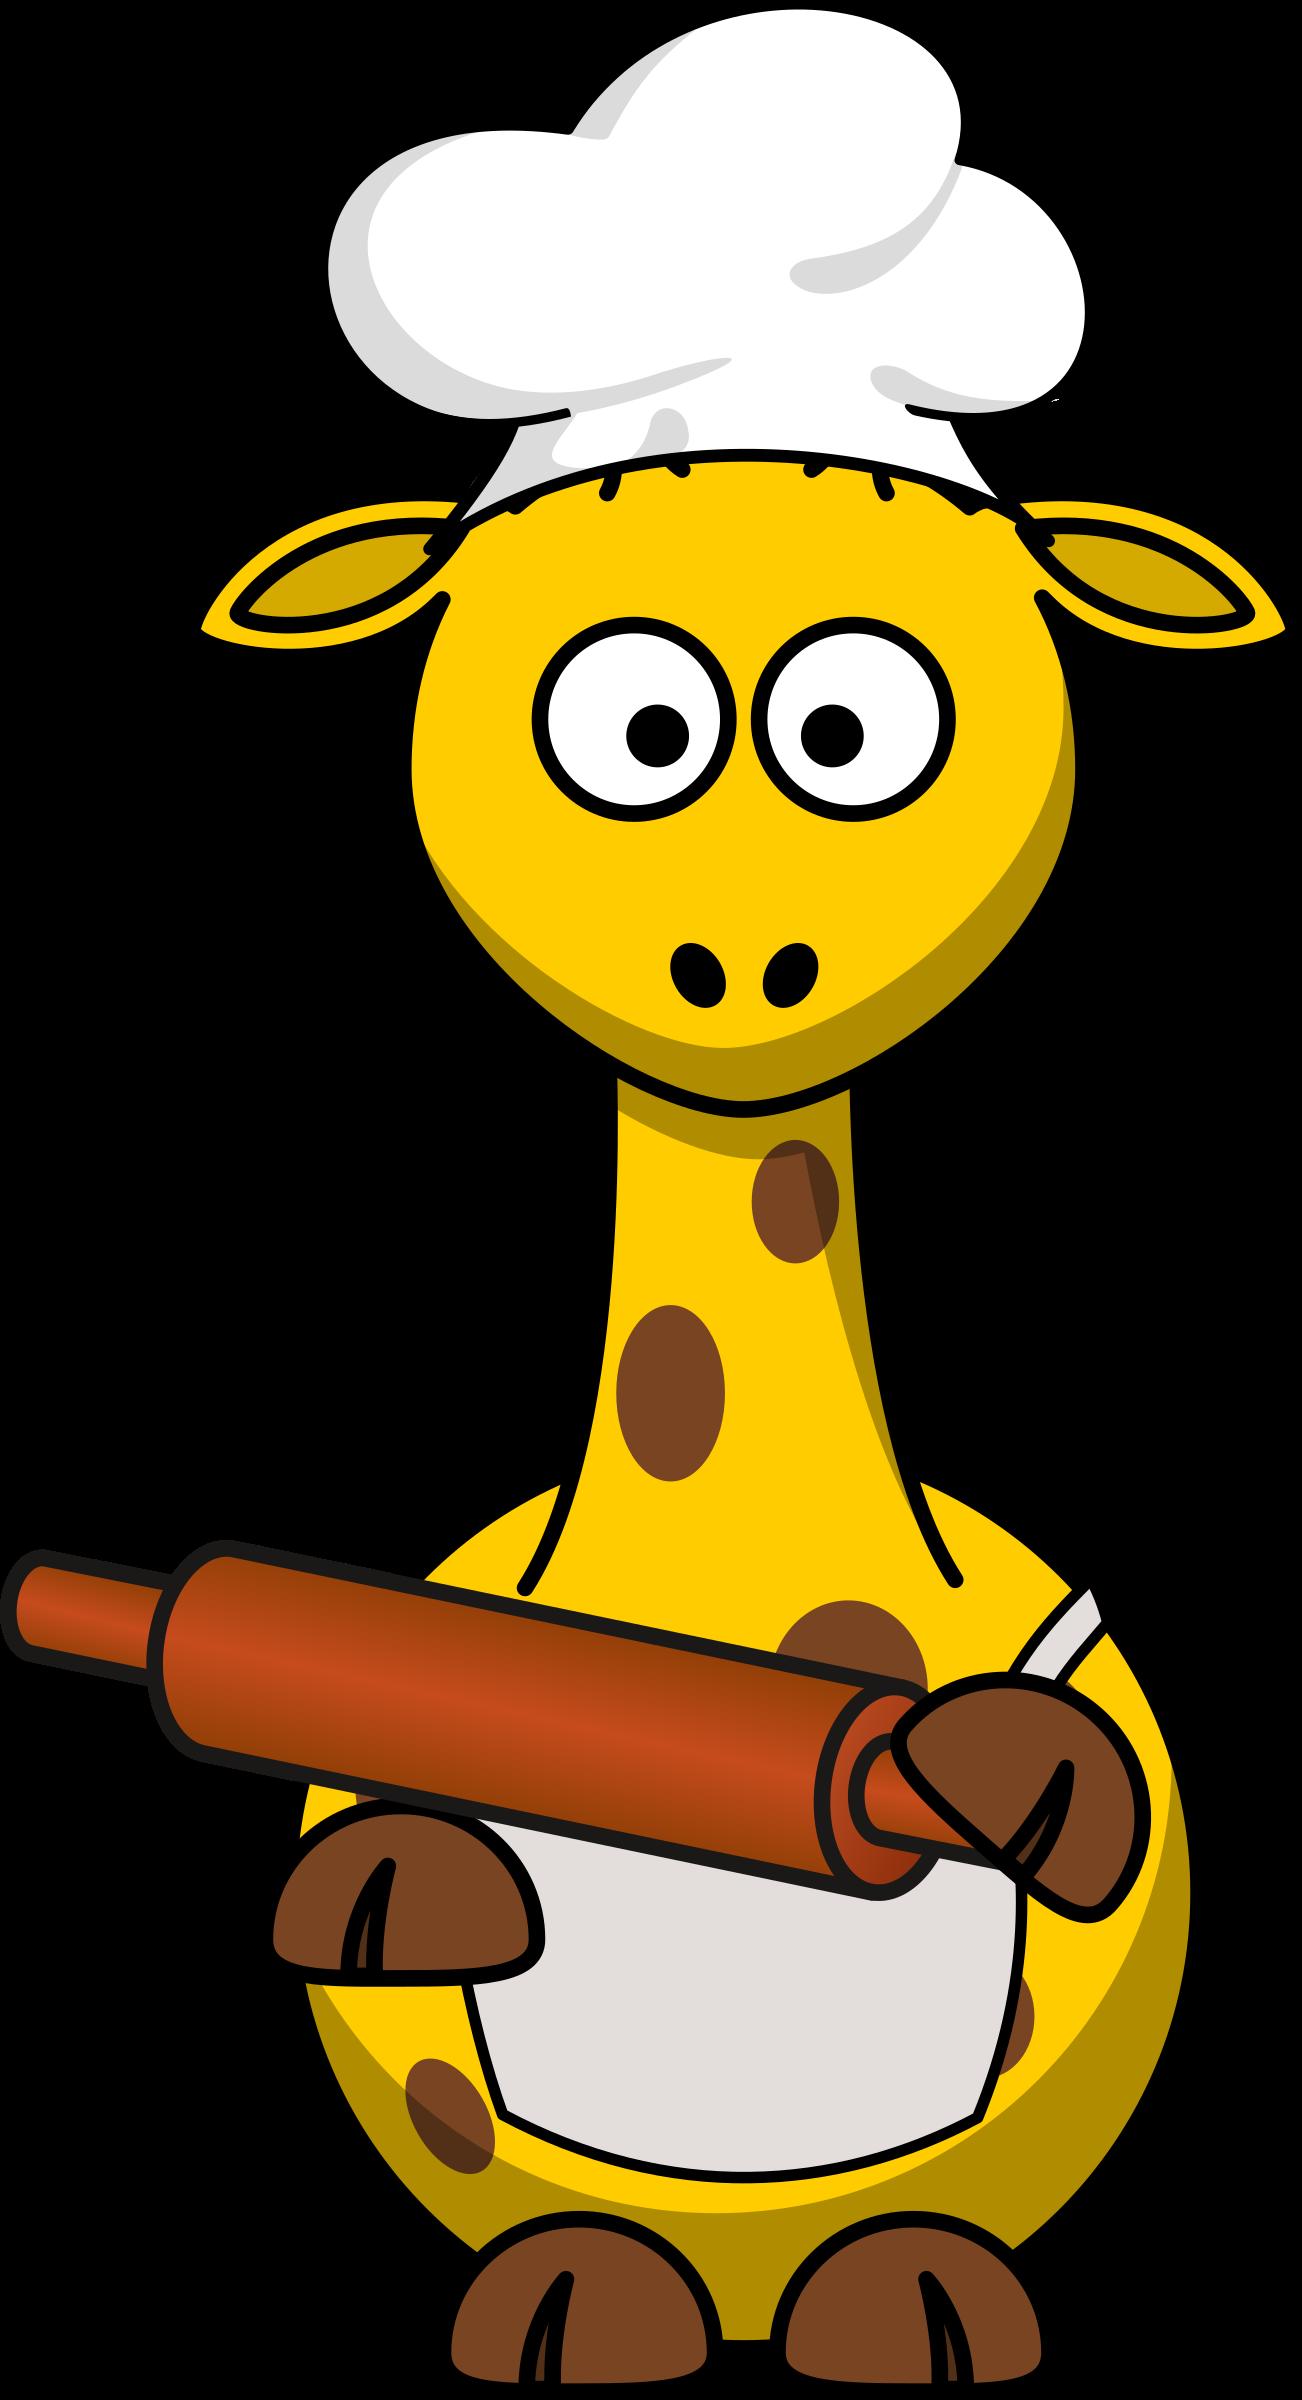 Giraffe big image png. Baker clipart transparent